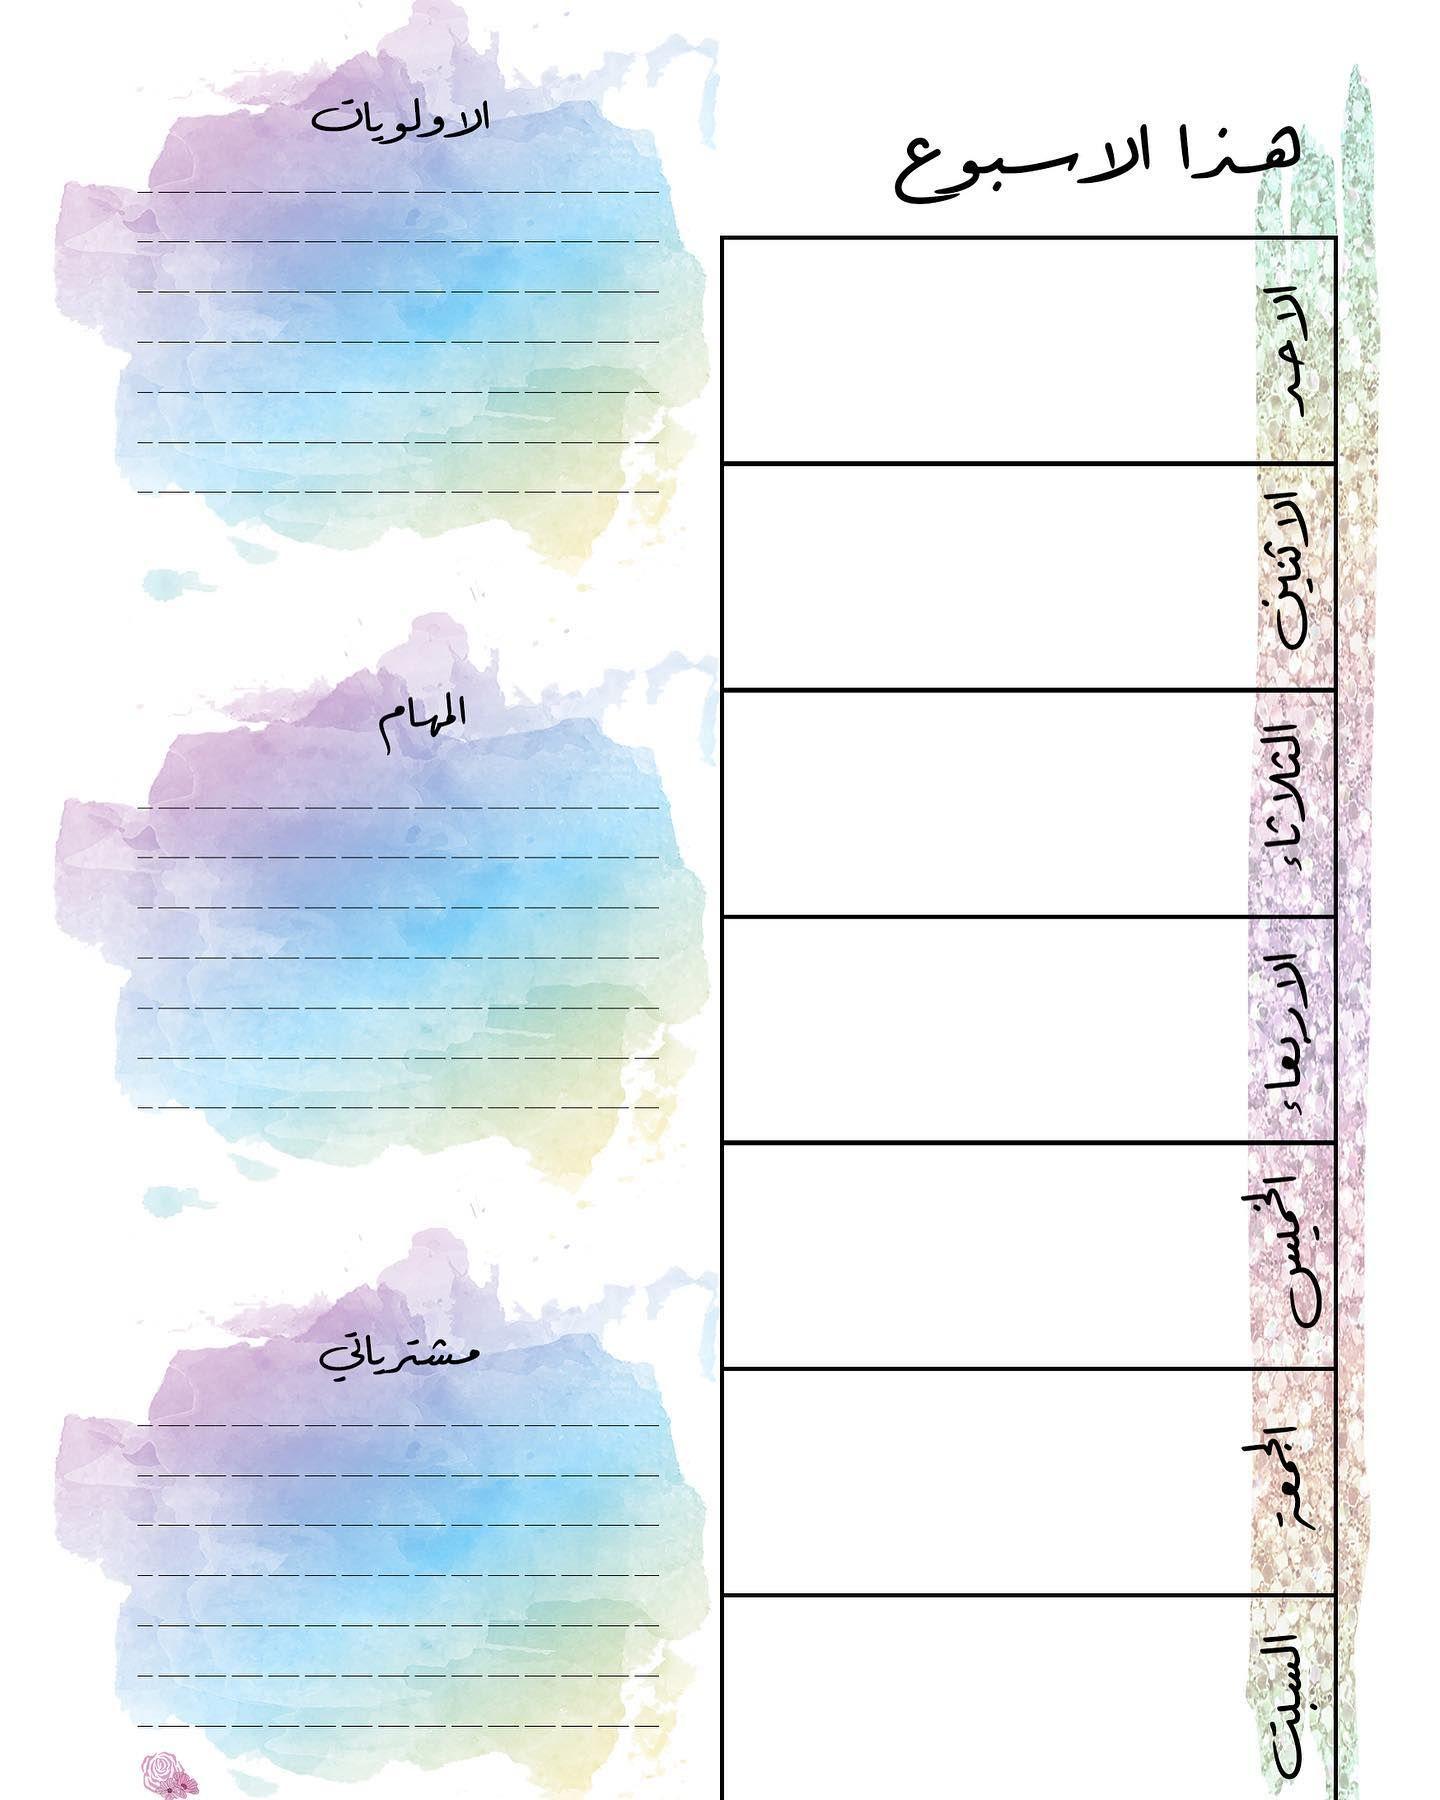 صفحات بلانر تخطيط اسبوعي واهدافي للتحميل في موقعنا تقدرون تزوروني موقعنا Www Paperdelightkw Com تلاقونهم ف Kids Planner Weekly Planner Stickers Print Planner